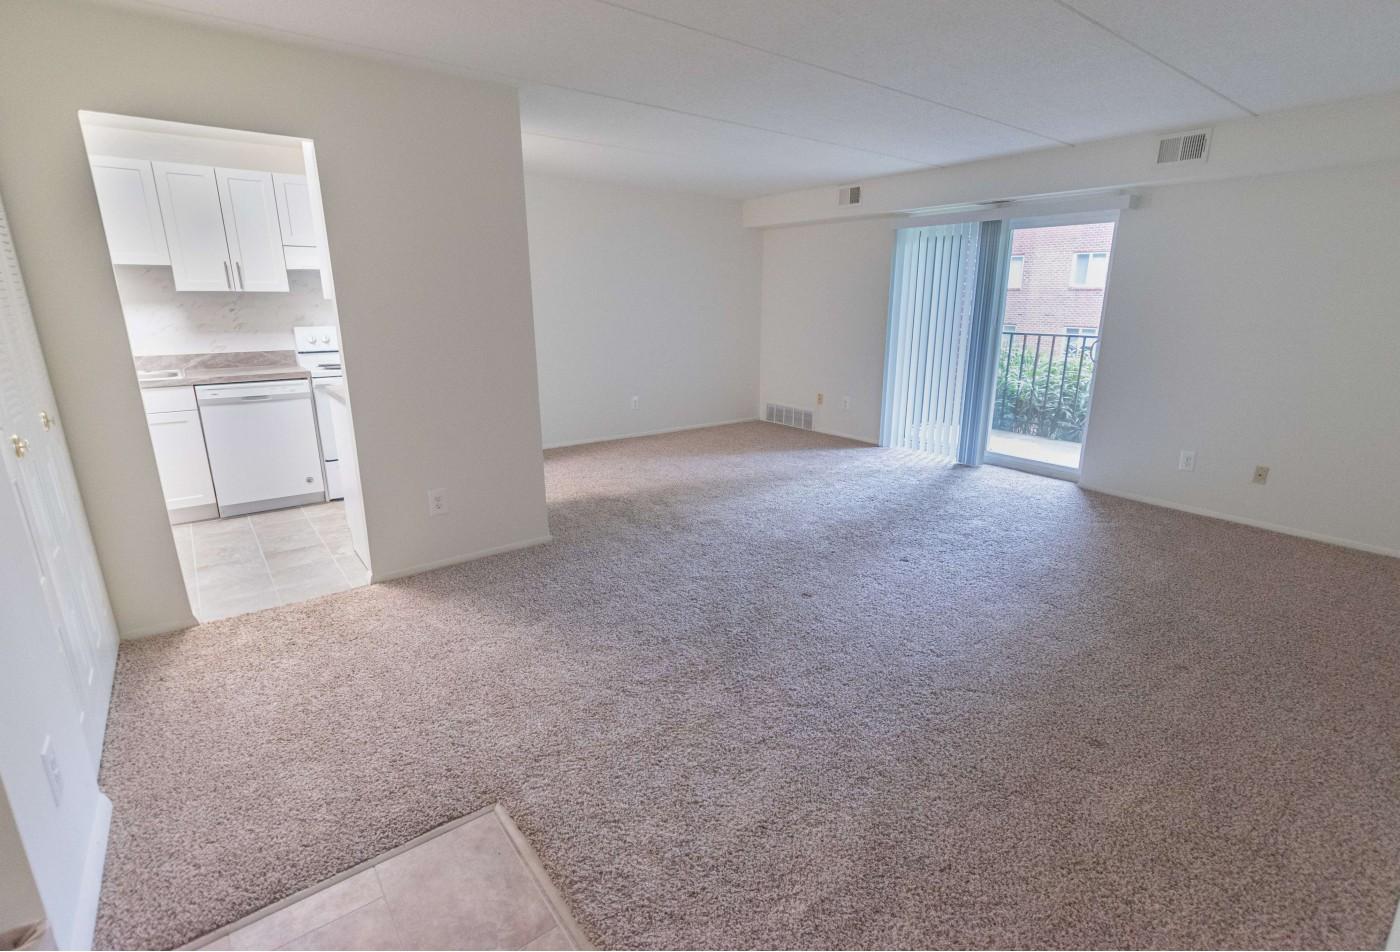 Apartments for rent in Aldan, PA | Lansdowne Towers Apartments